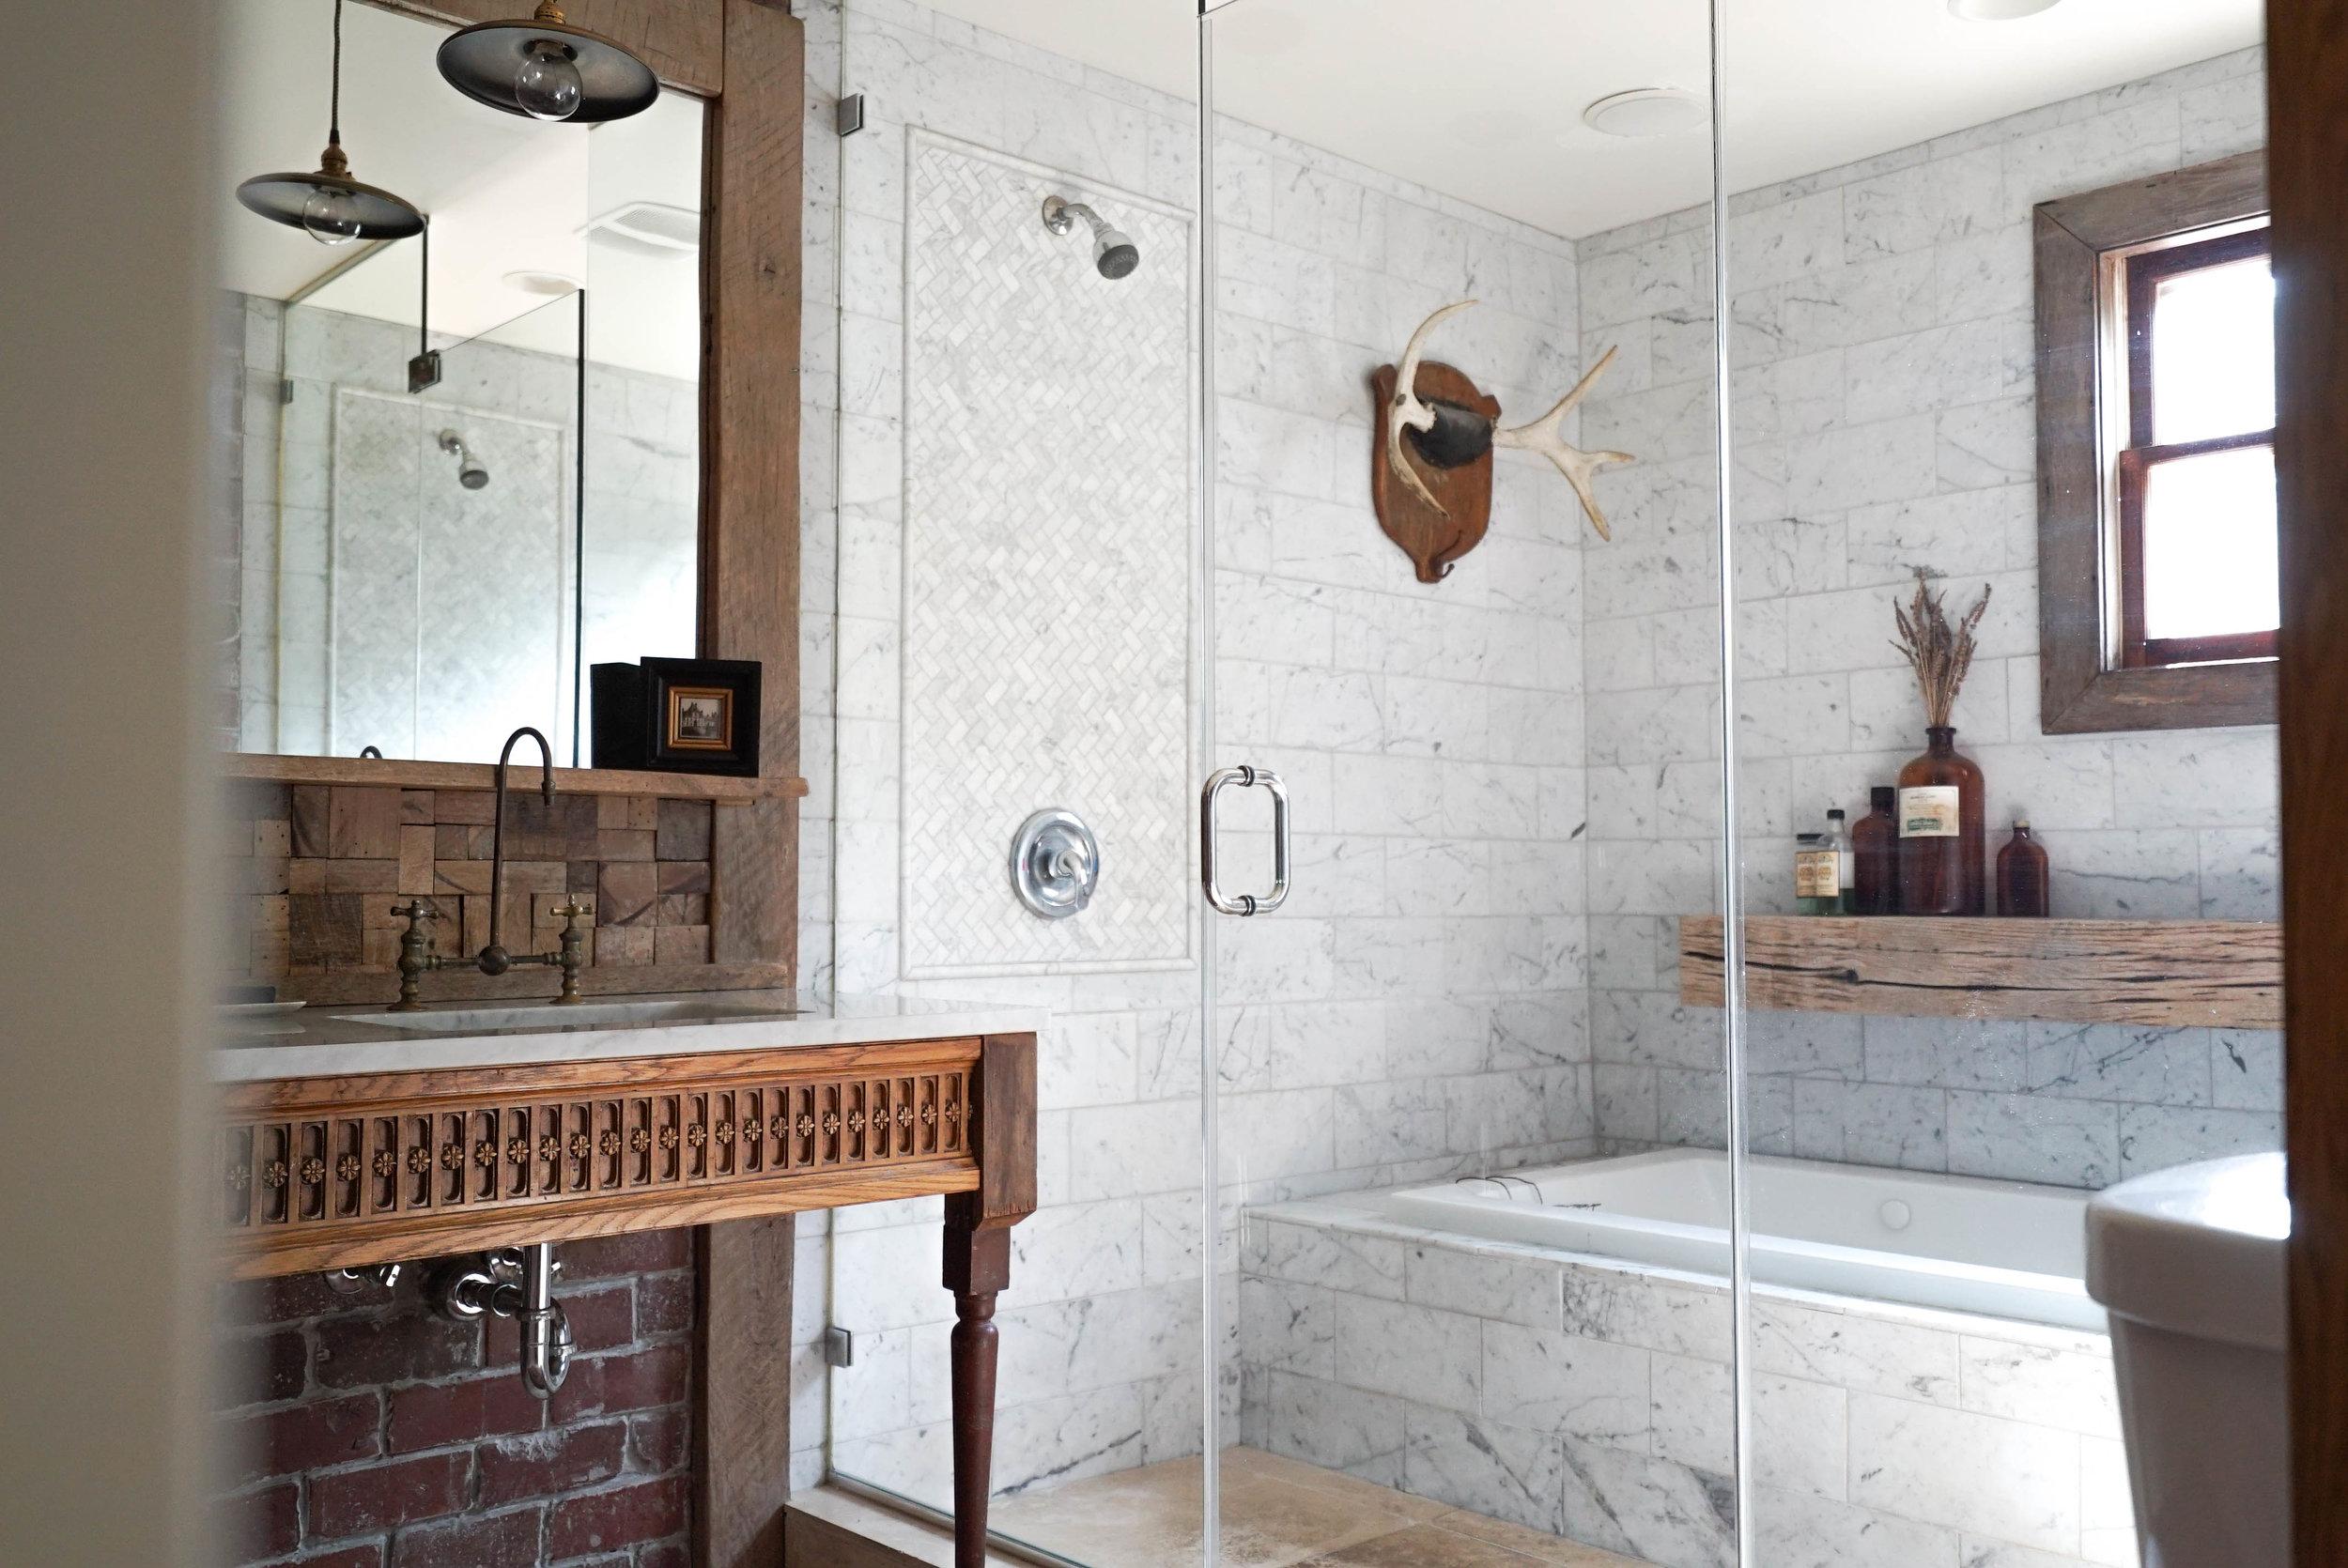 bathroom vanity at an angle.jpg